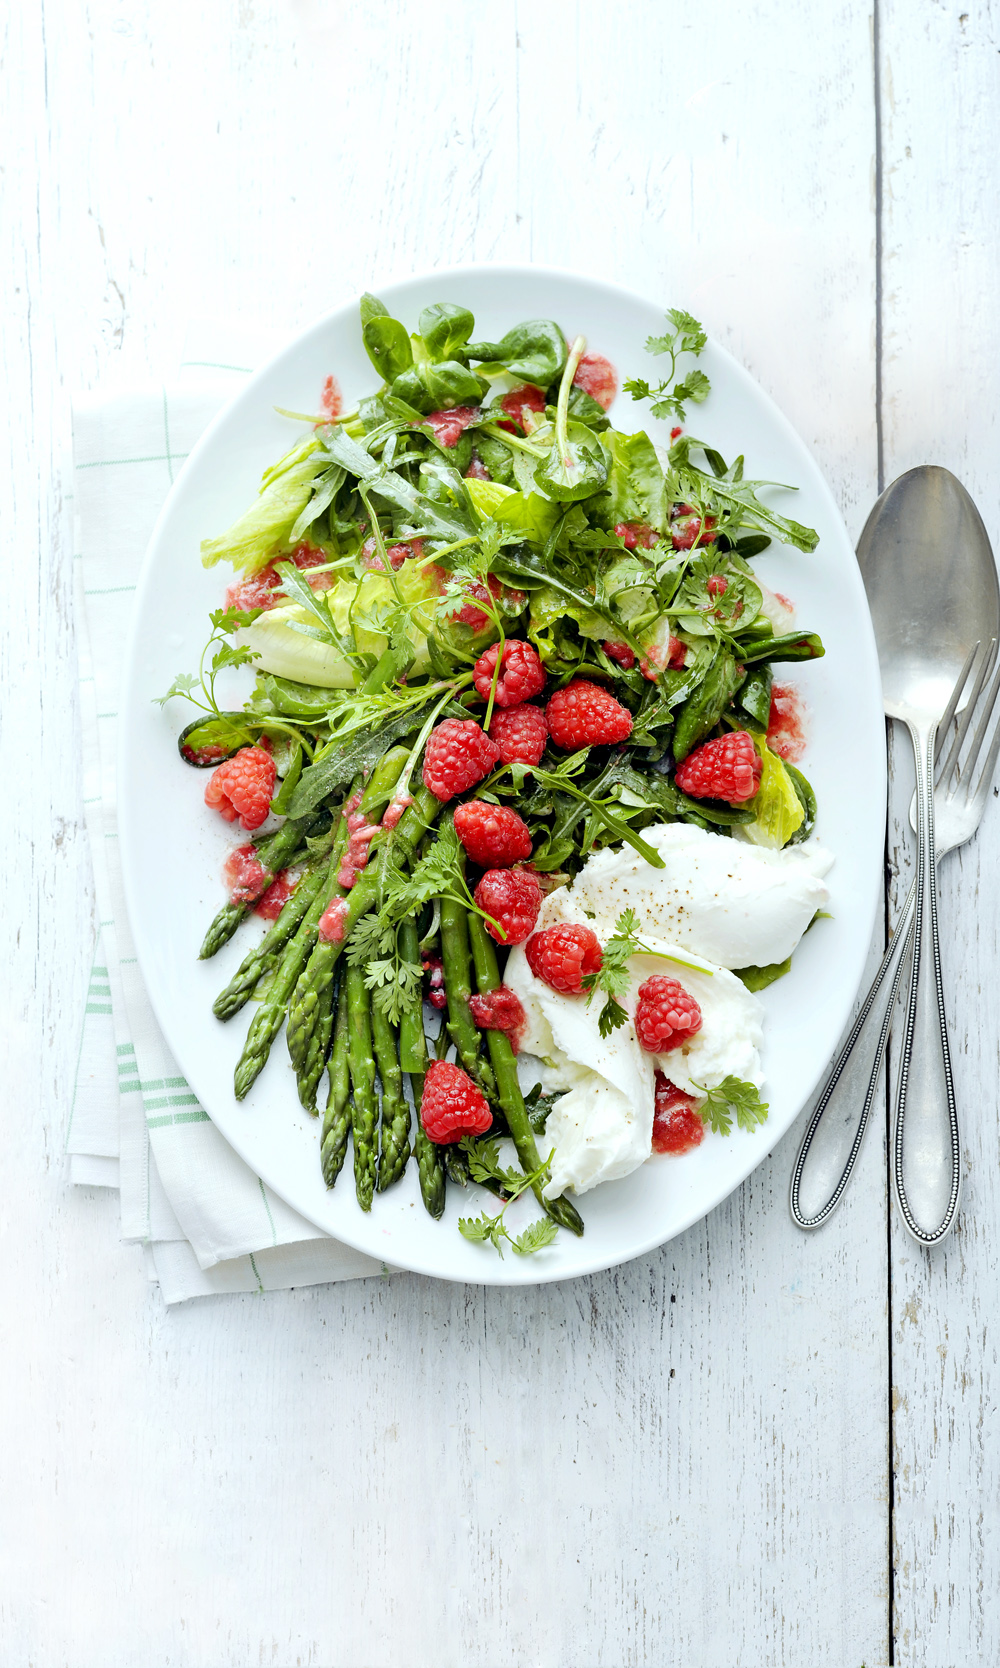 salade met frambozendressing en mozzarella